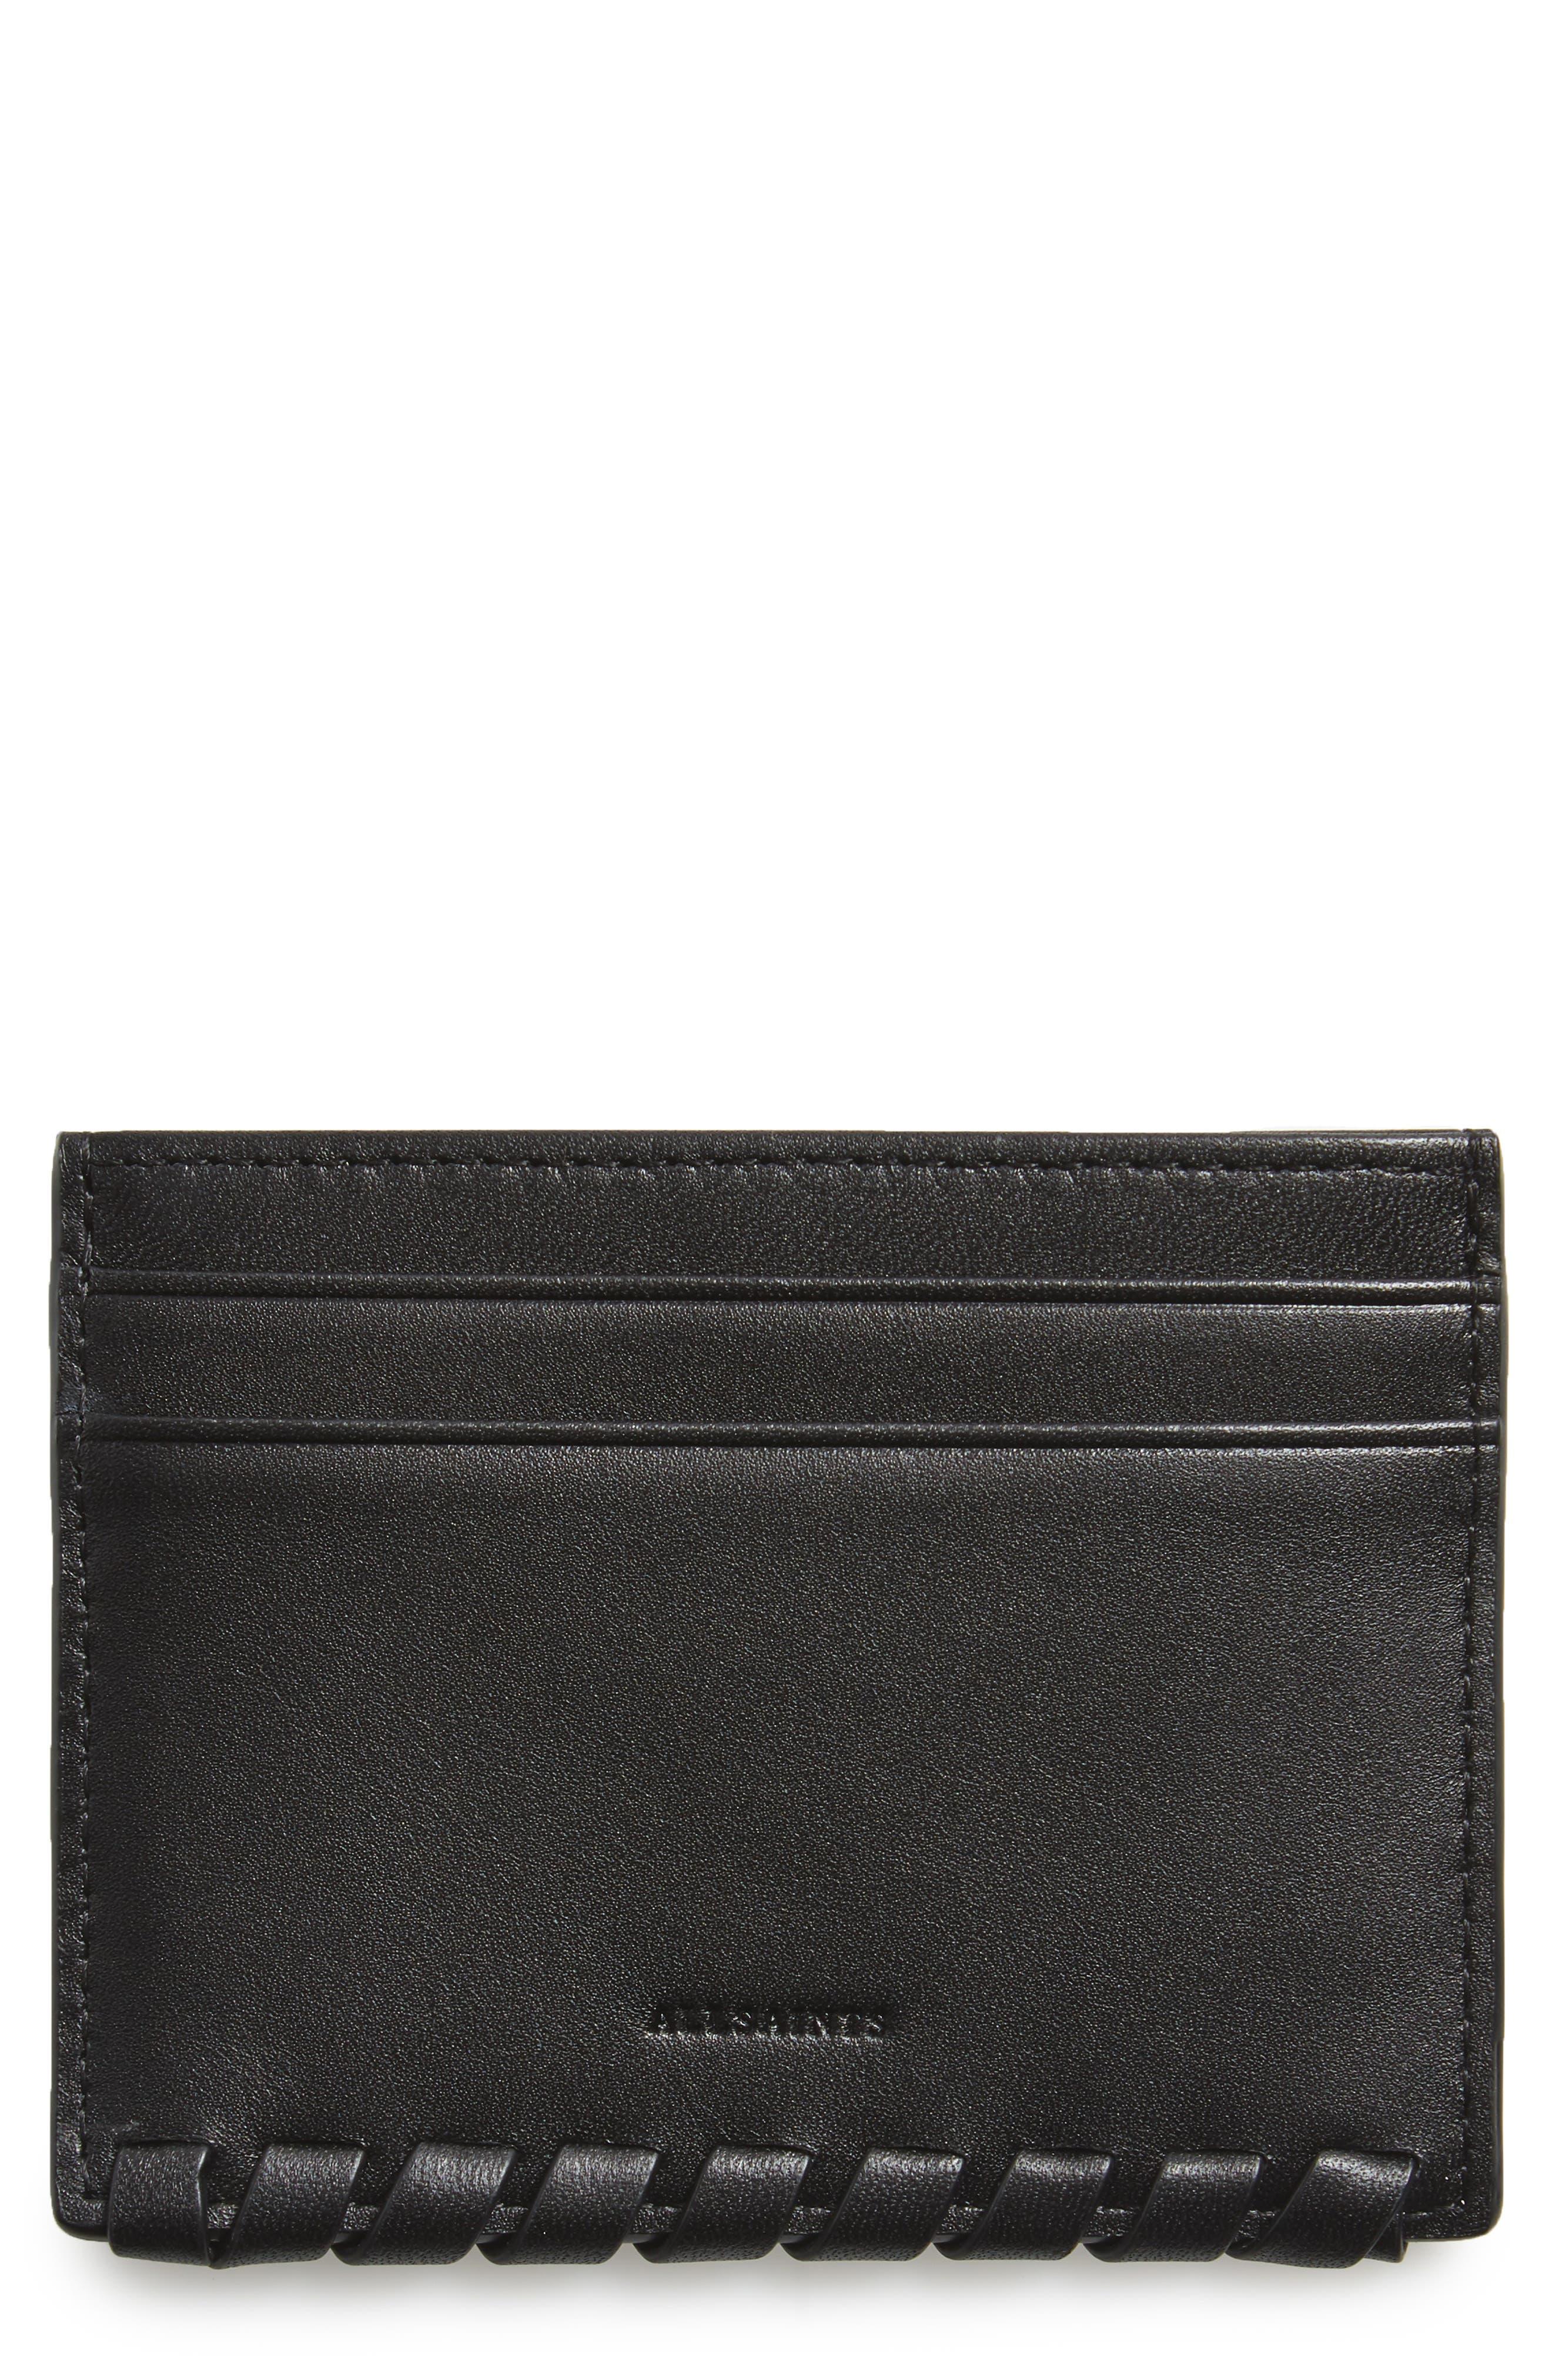 Alternate Image 1 Selected - ALLSAINTS Kita Pebbled Leather Card Case